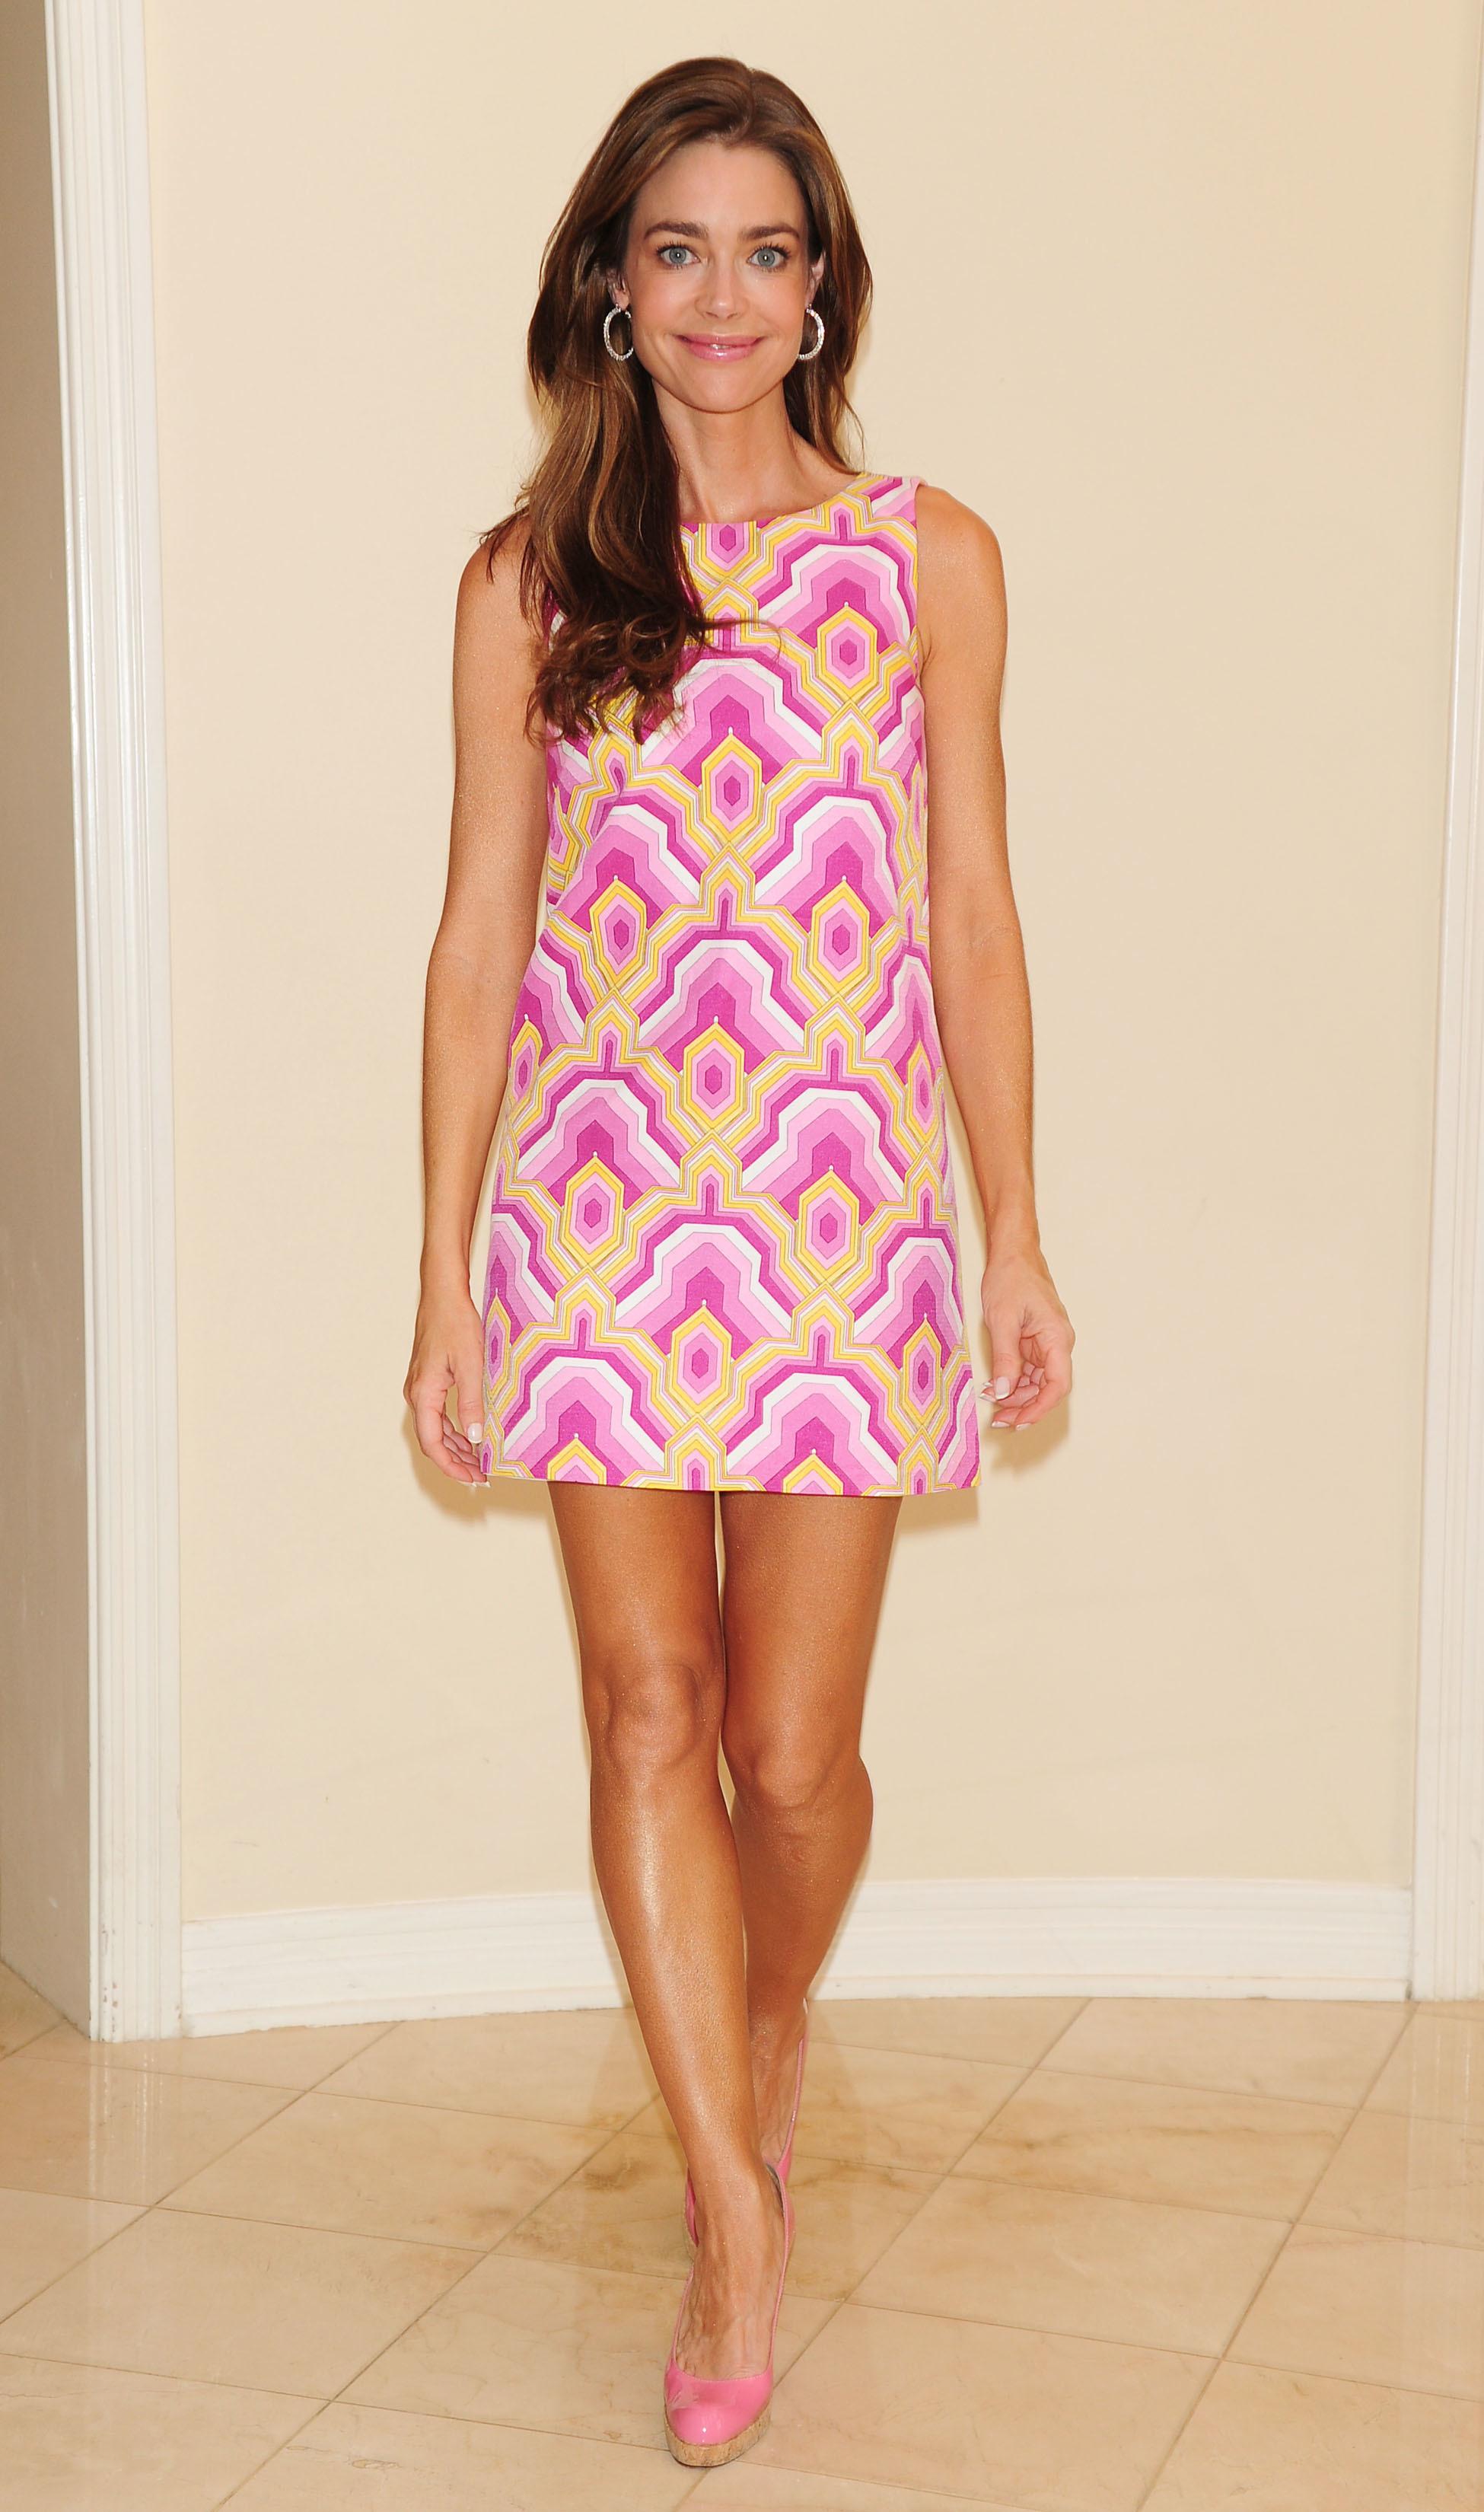 denise richards pink dress